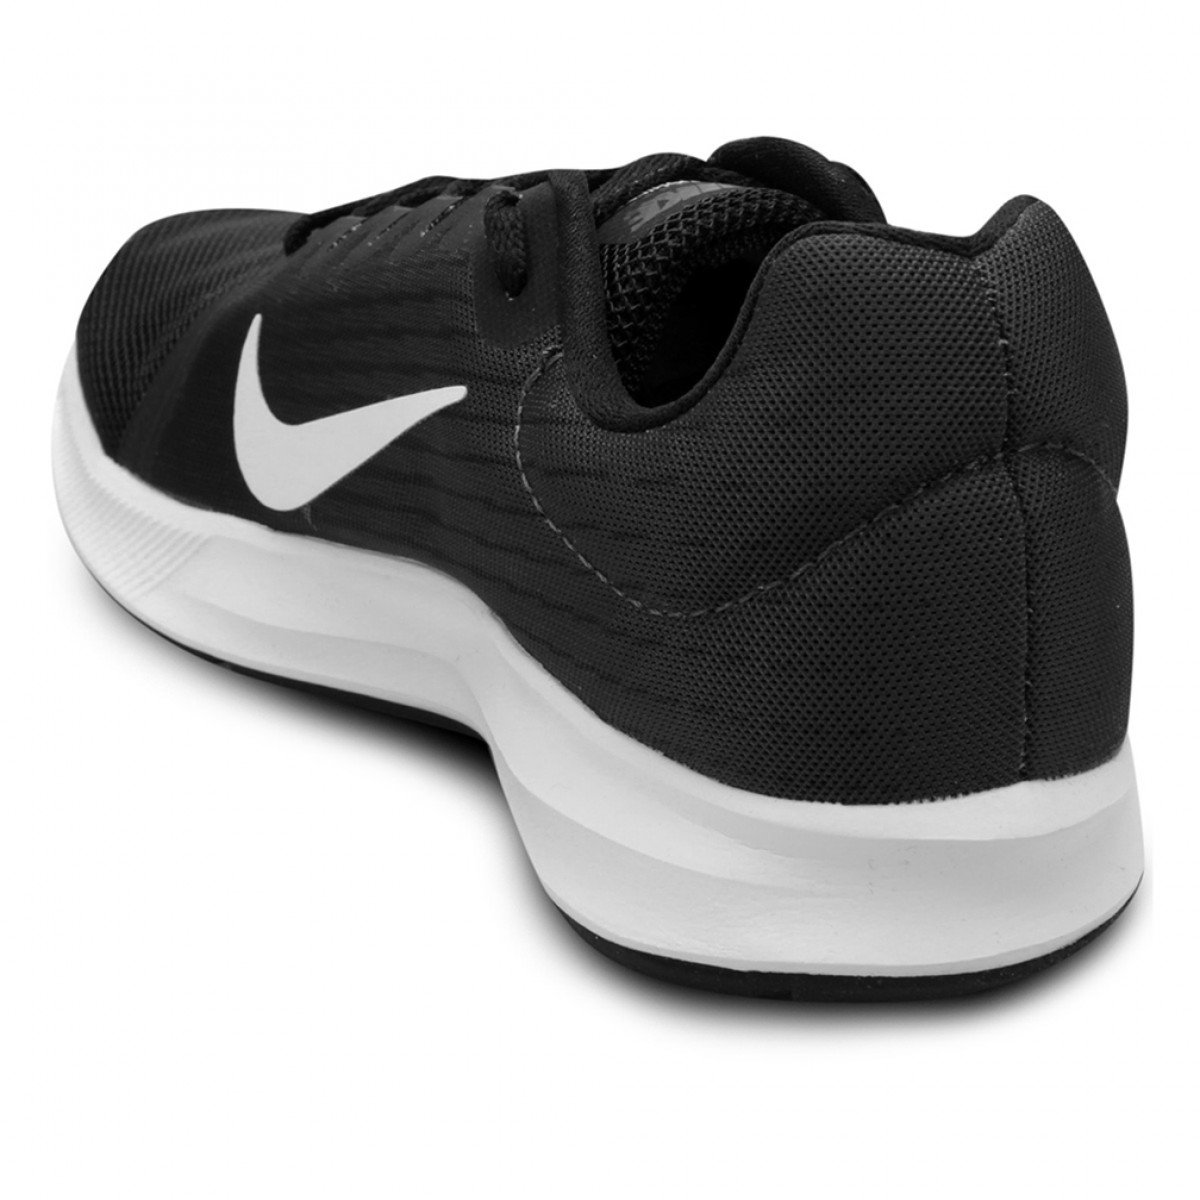 Tênis Nike Wmns Downshifter 8 Feminino Preto E Branco